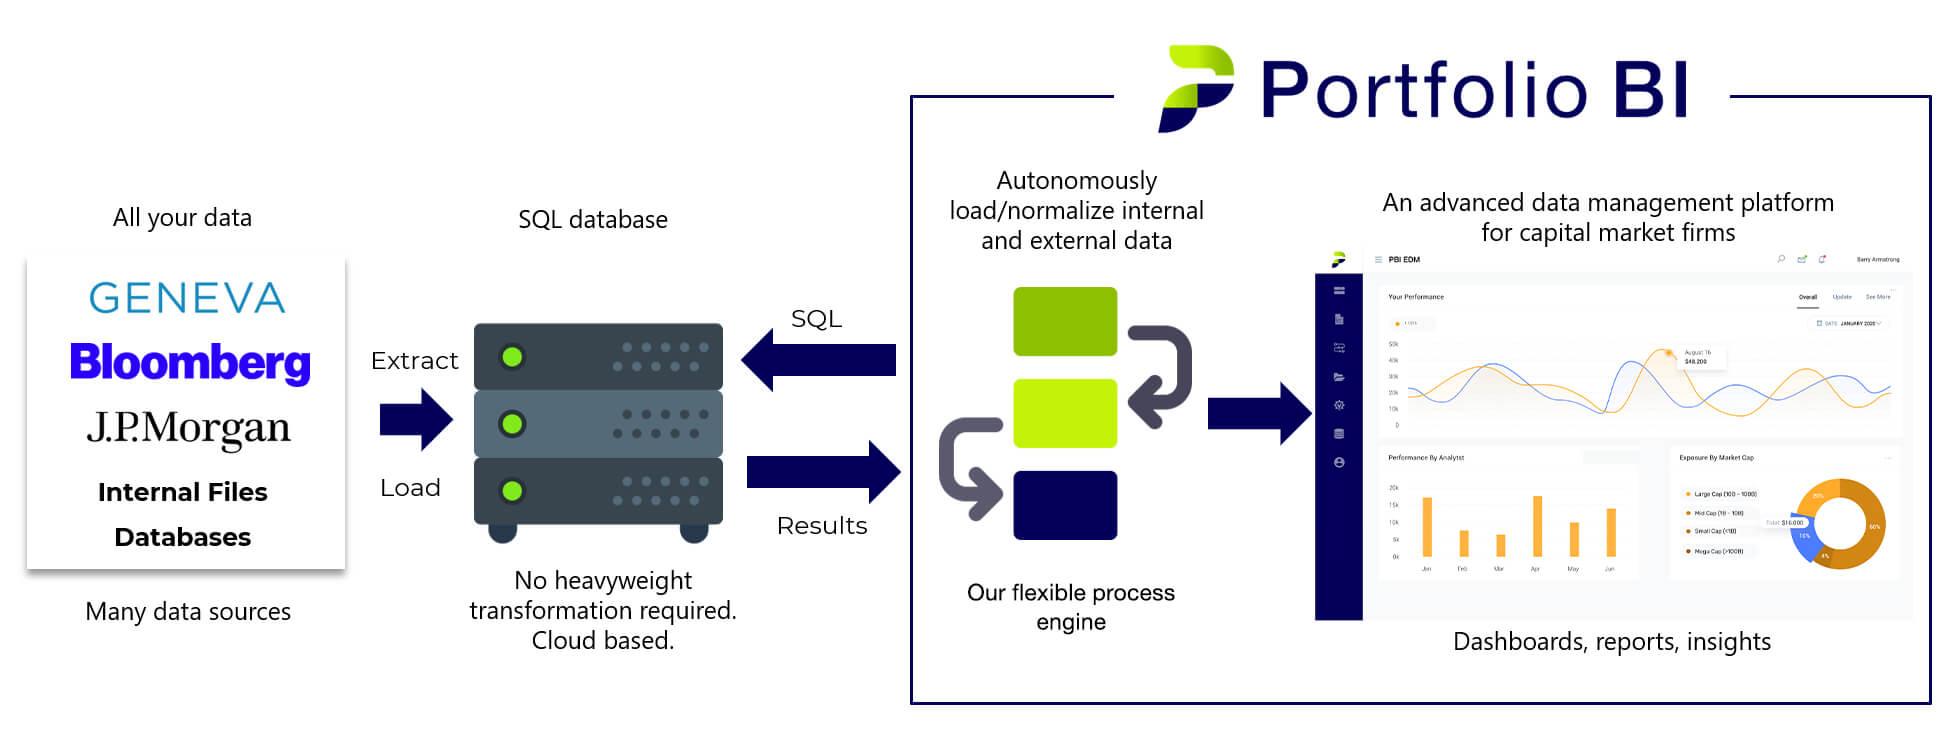 Portfolio BI data management architecture overview small.